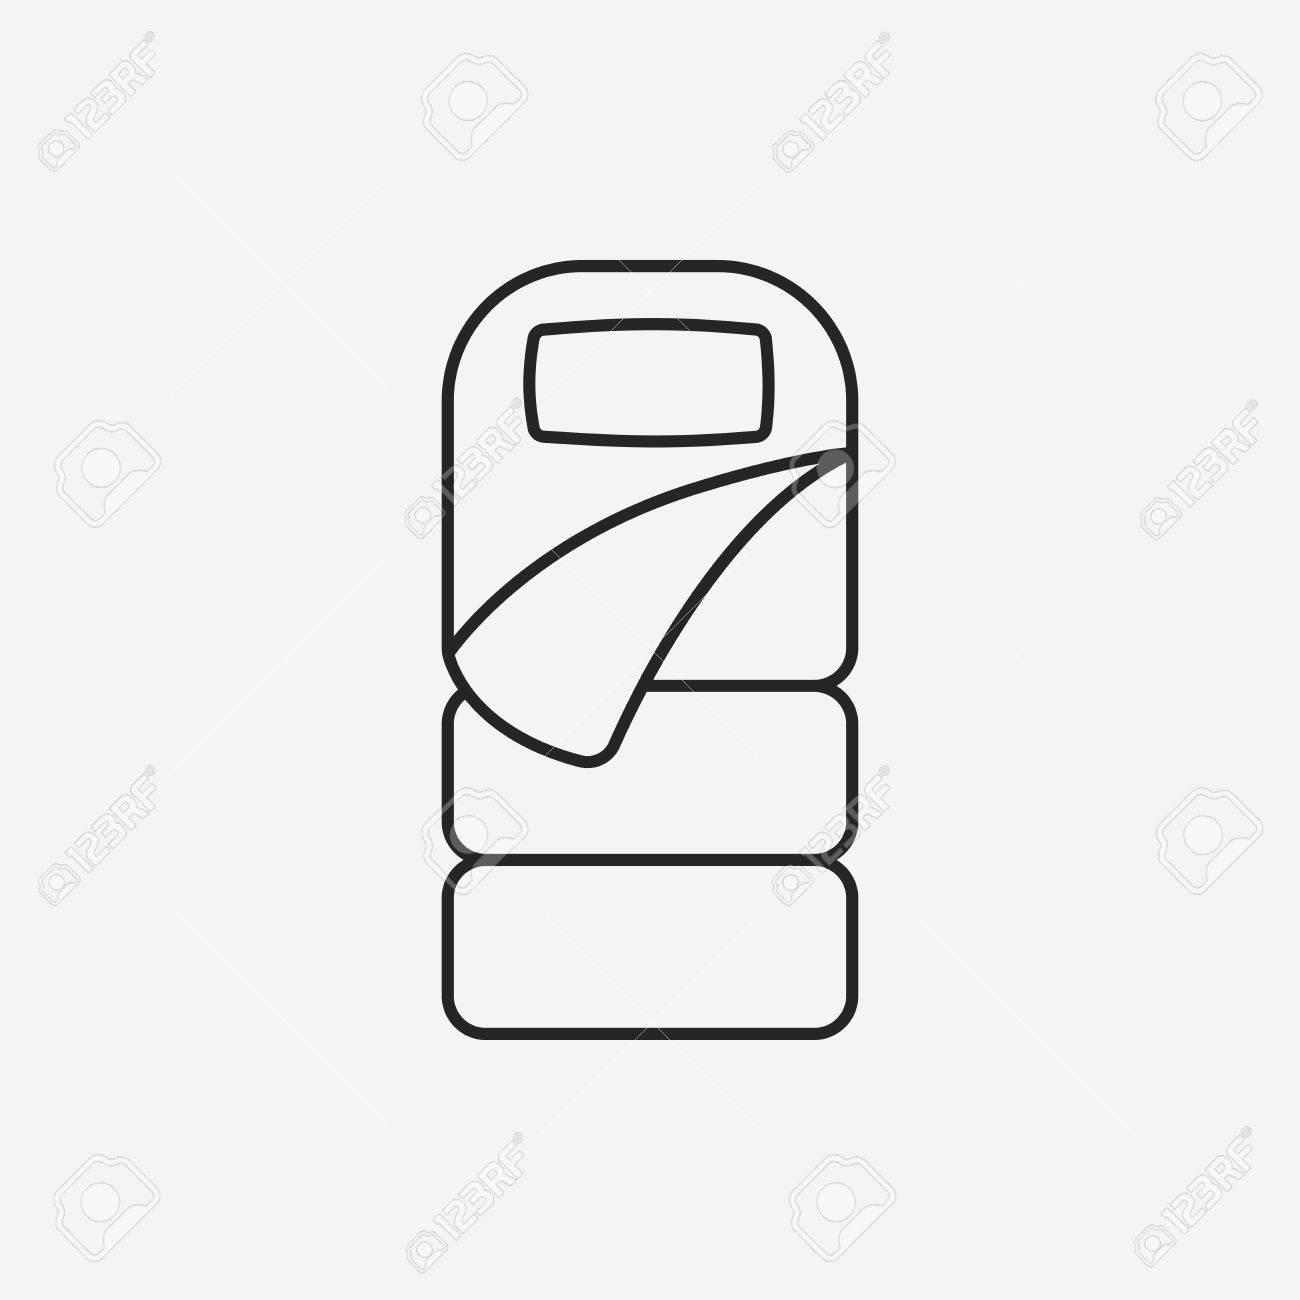 Sleeping Bag Line Icon Stock Vector